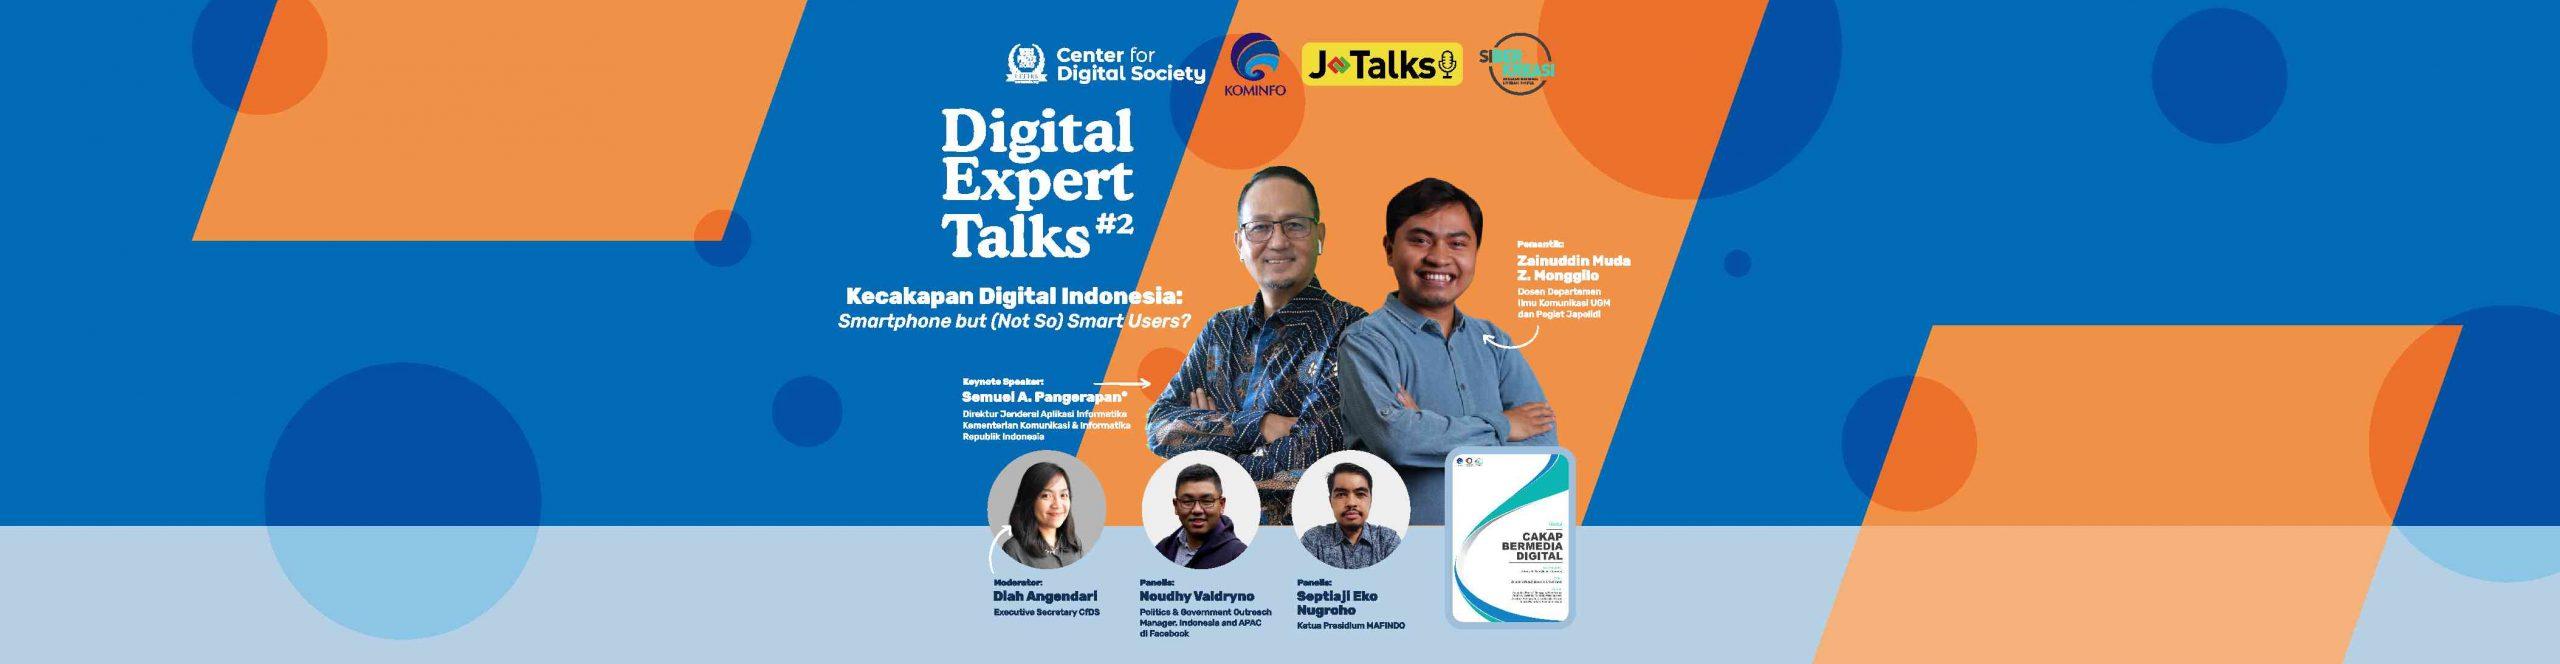 [SIARAN PERS] Kecakapan Digital Indonesia: Smartphone but (Not So) Smart Users? | DIGITAL EXPERT TALKS #2